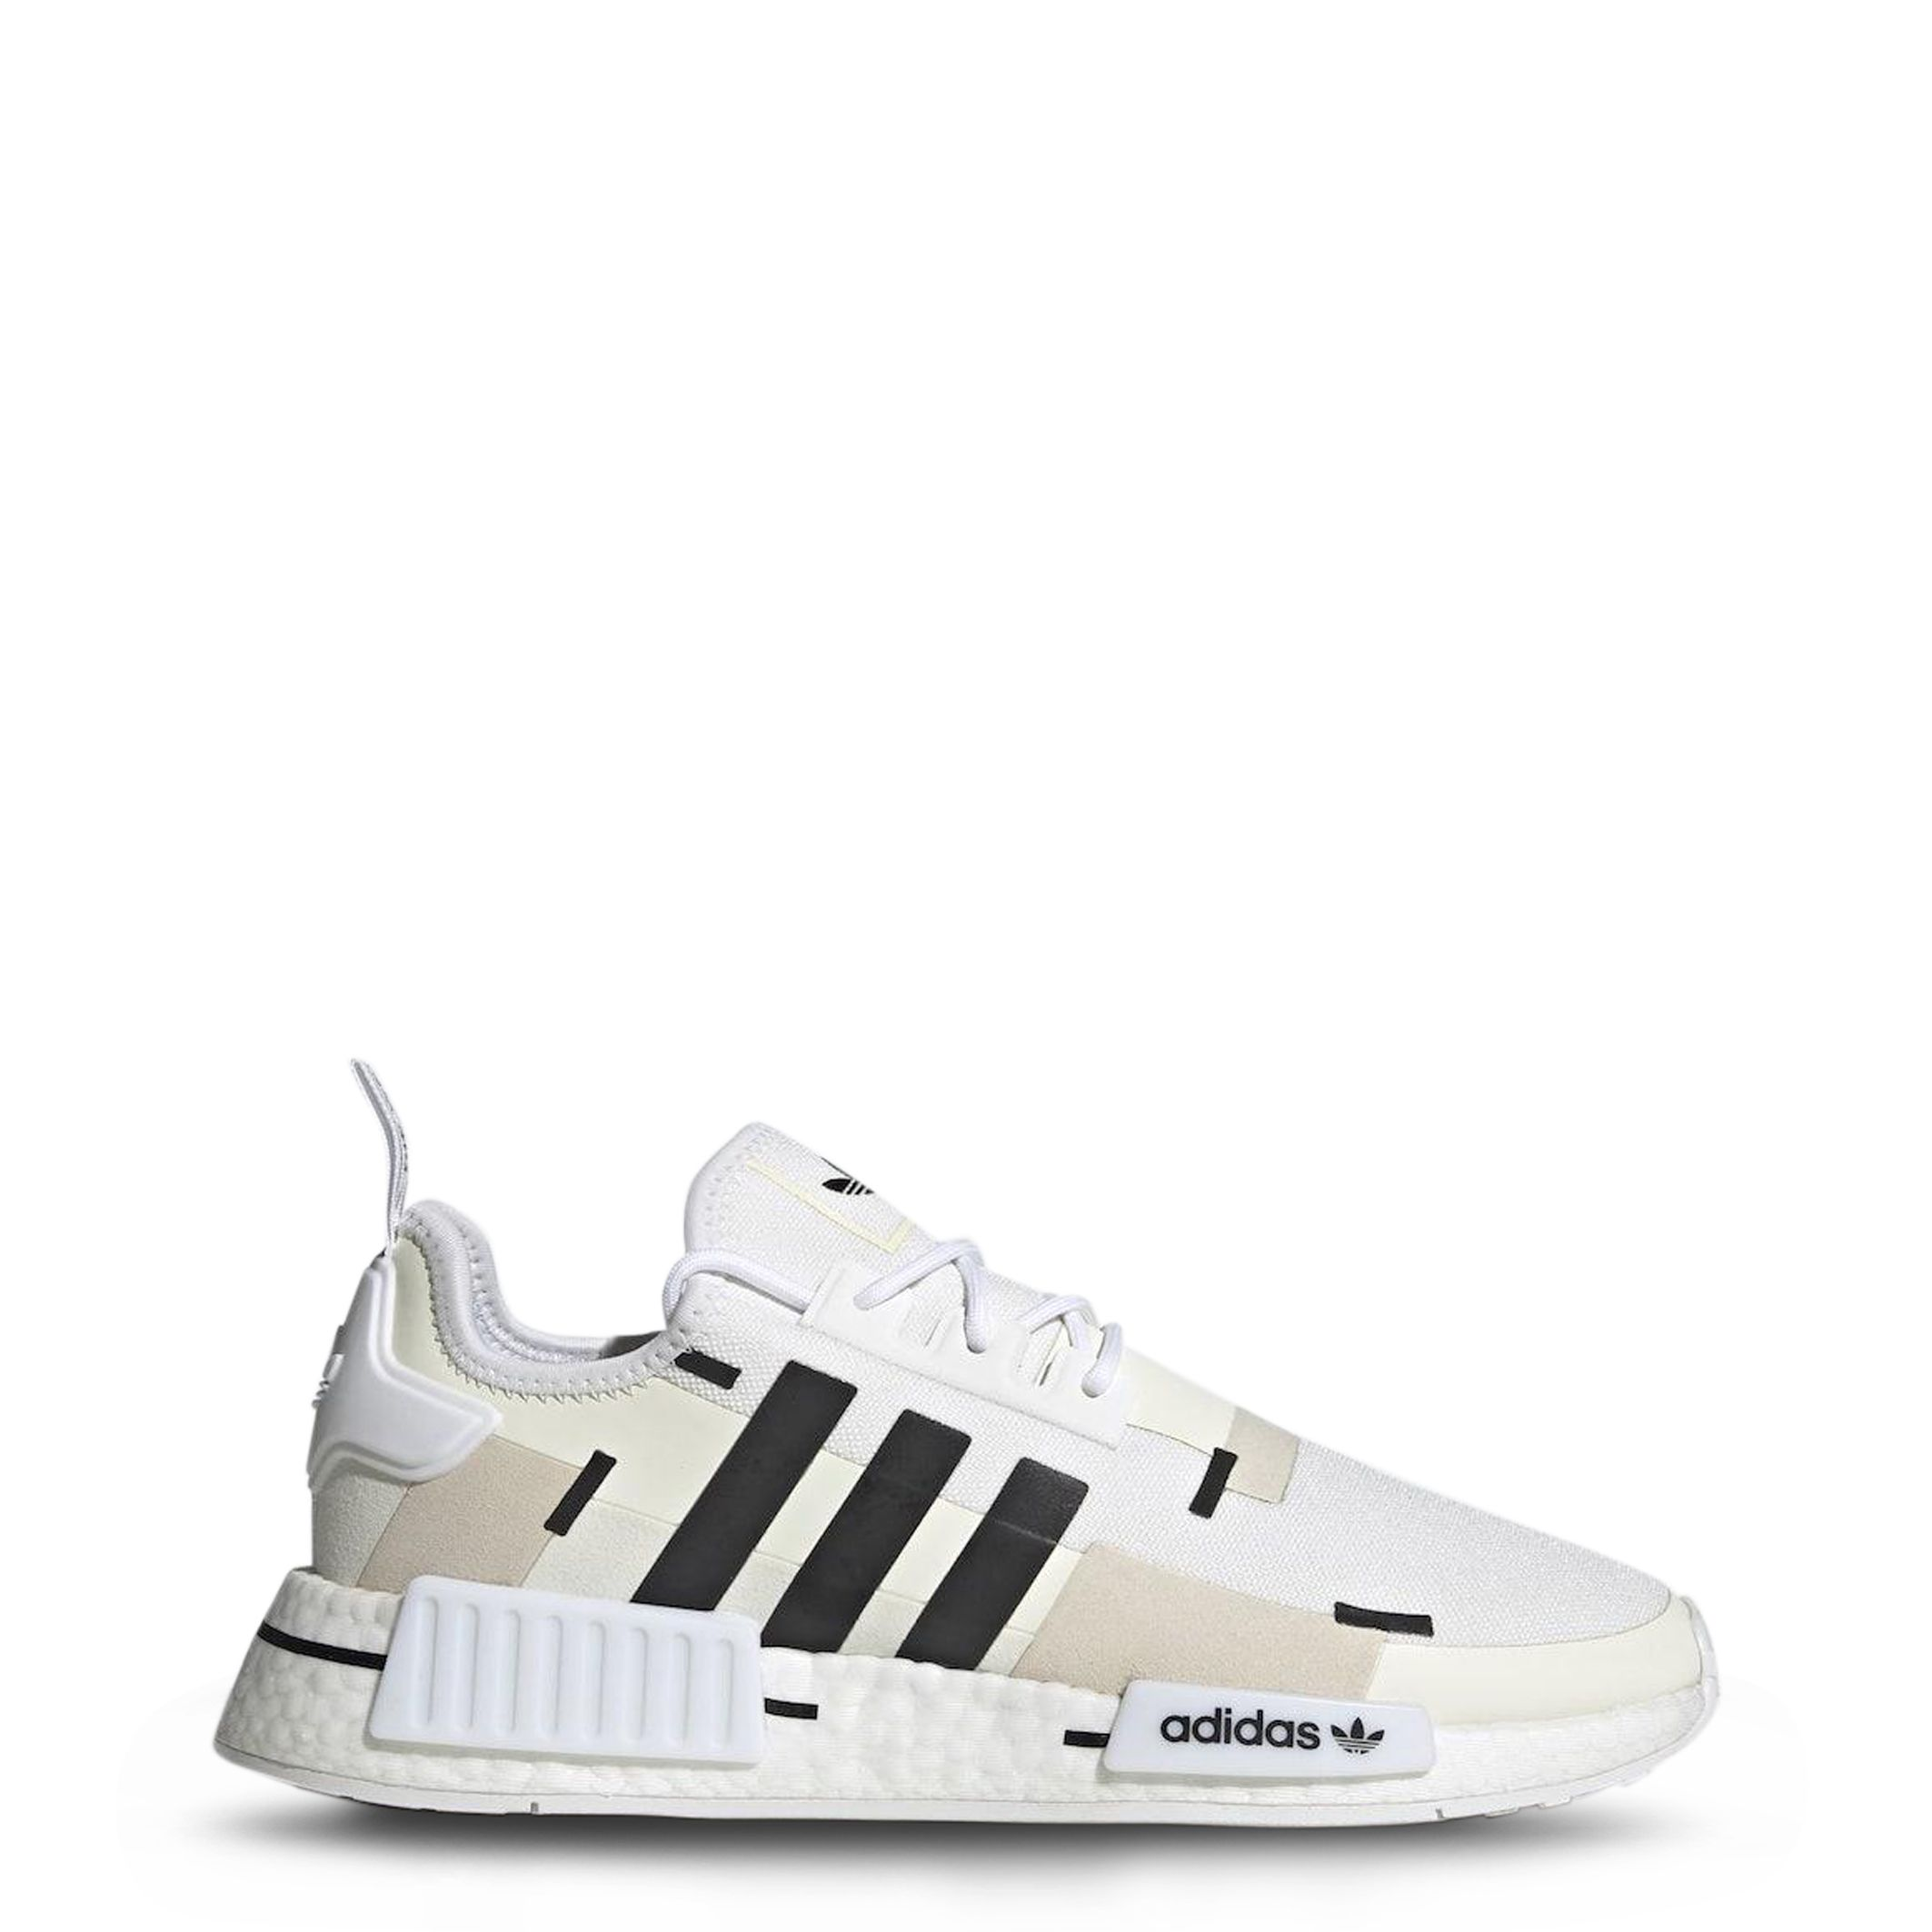 Adidas – NMD_R1 – Wit Designeritems.nl